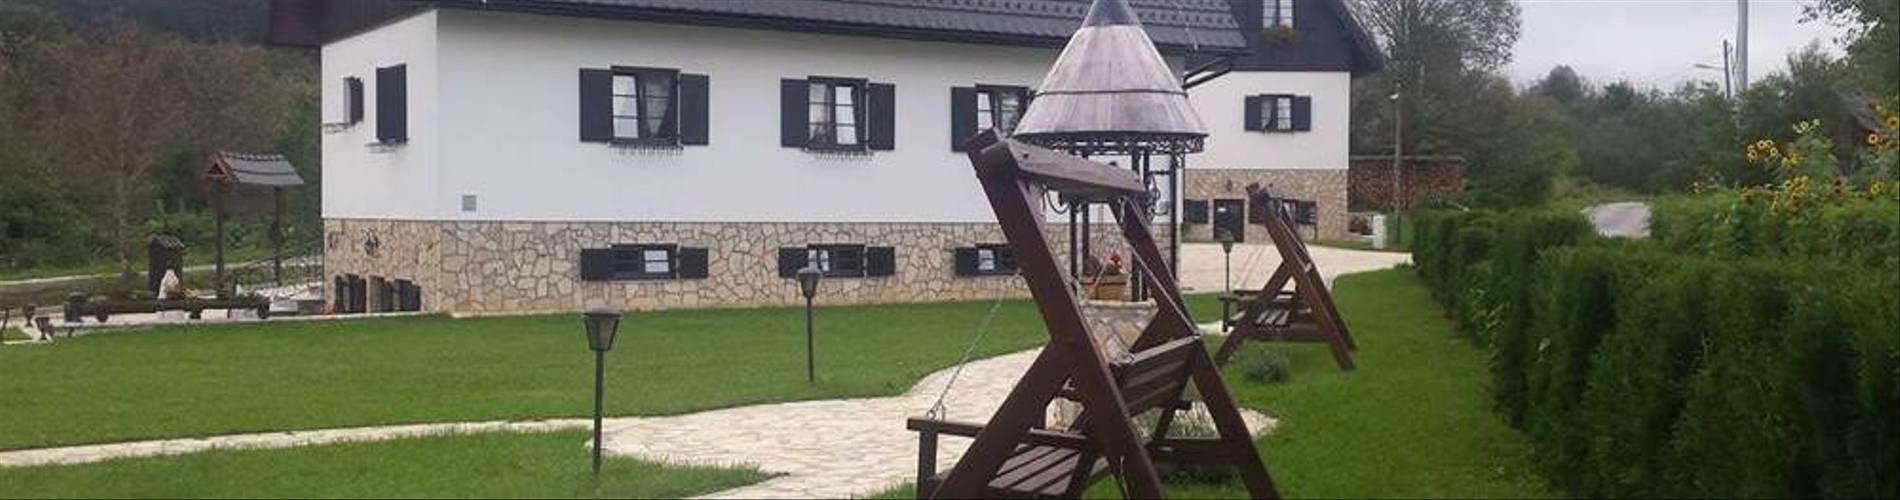 Etno-Garden-Plitvice-Lakes-Accomodation-26.jpg